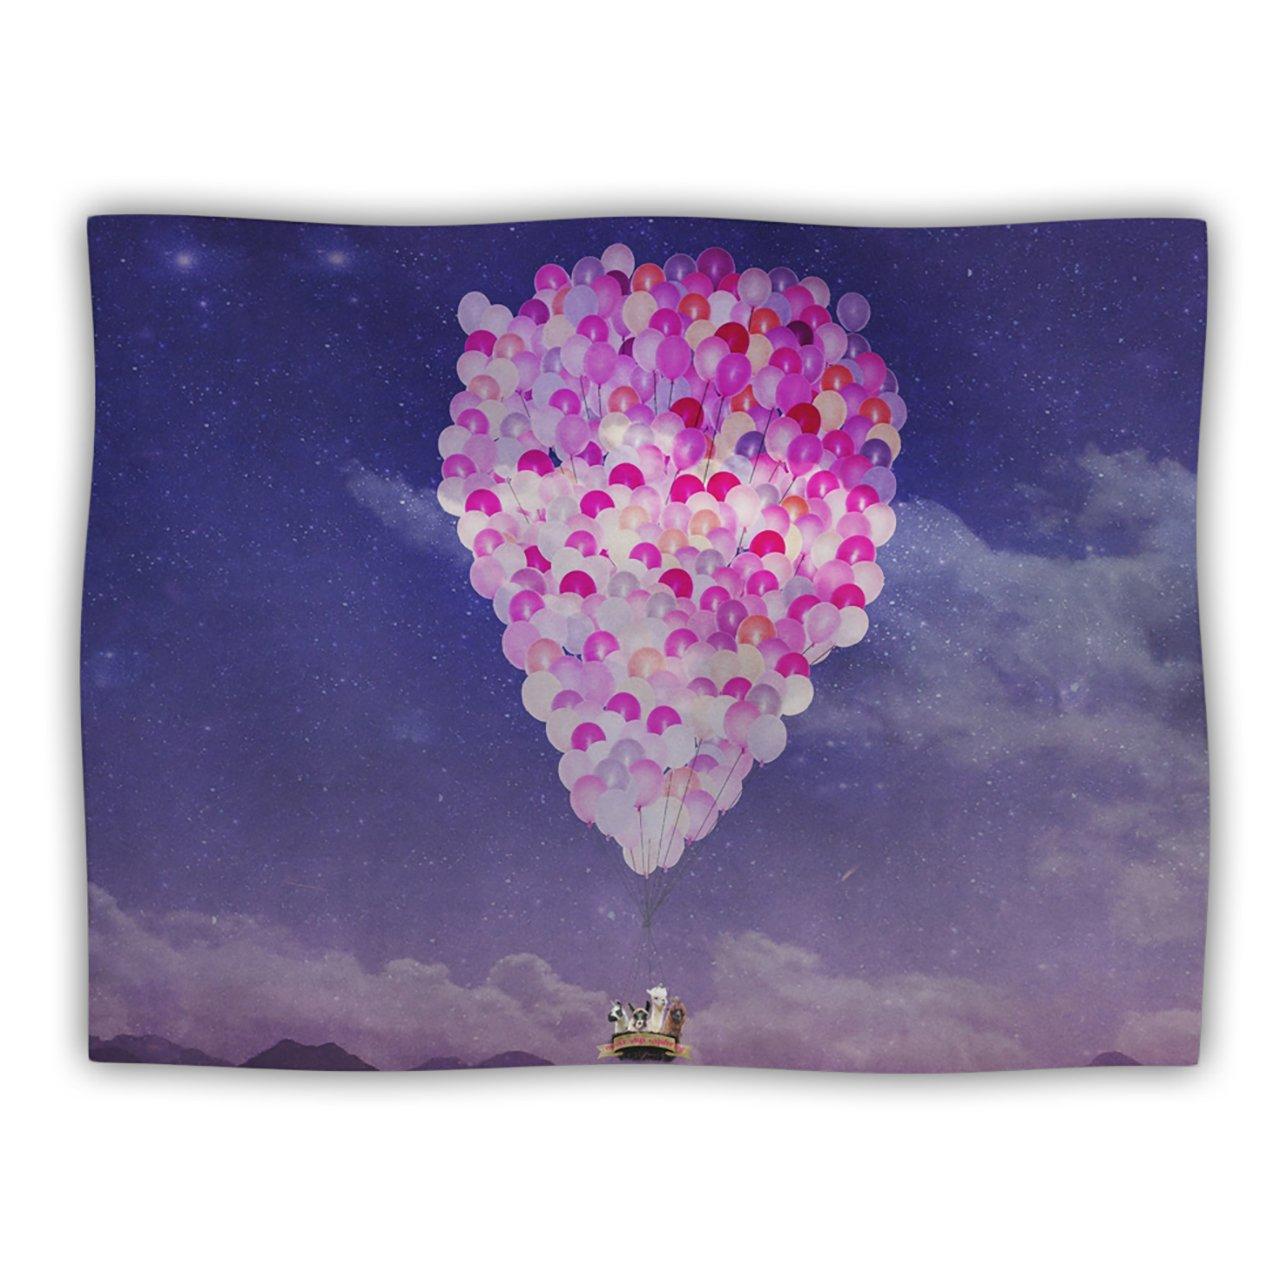 Kess InHouse Monika Strigel 'Never Stop Exploring IV' Dog Blanket, 40 by 30-Inch